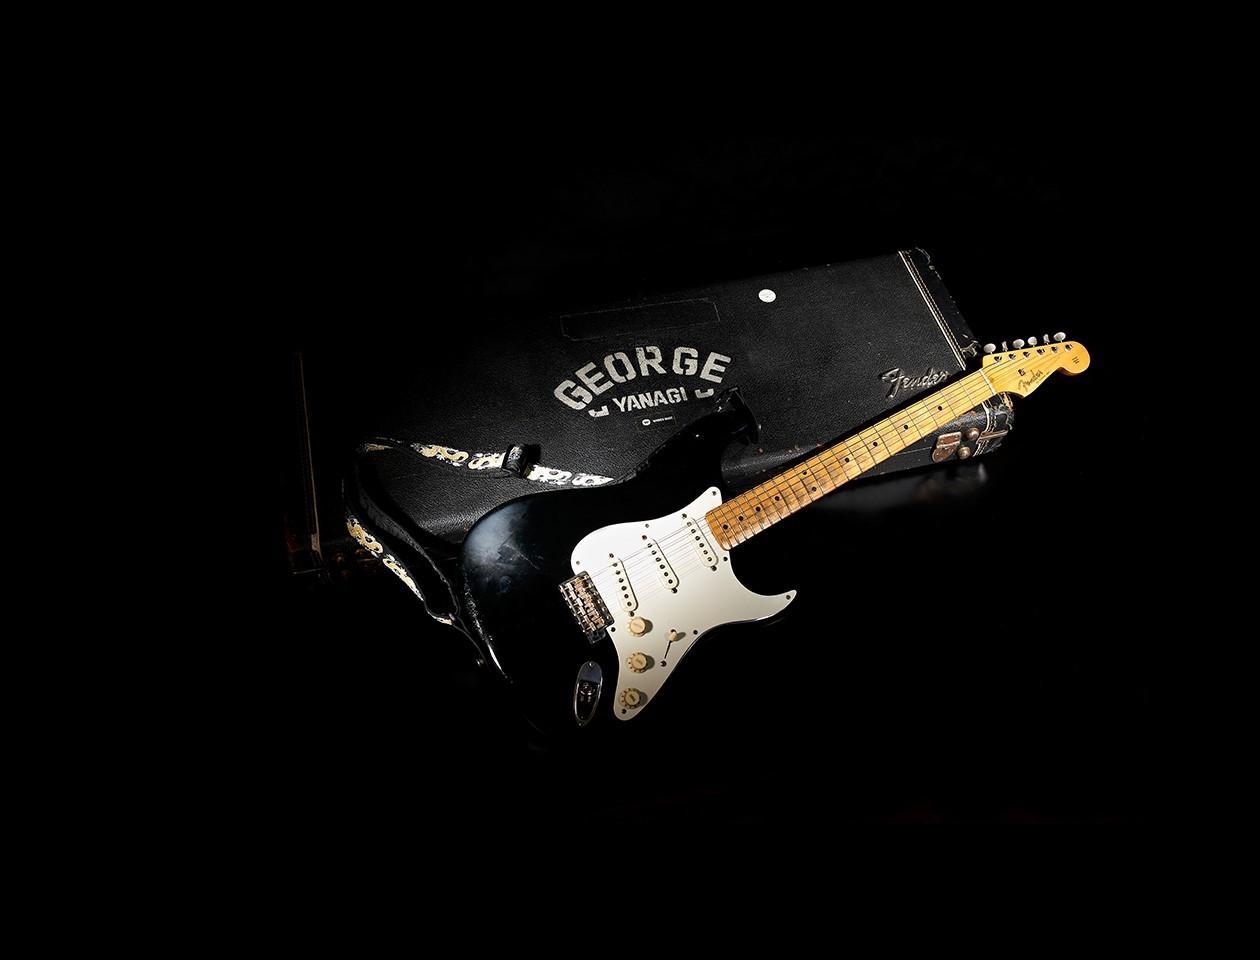 guitar1260_960_2.jpg